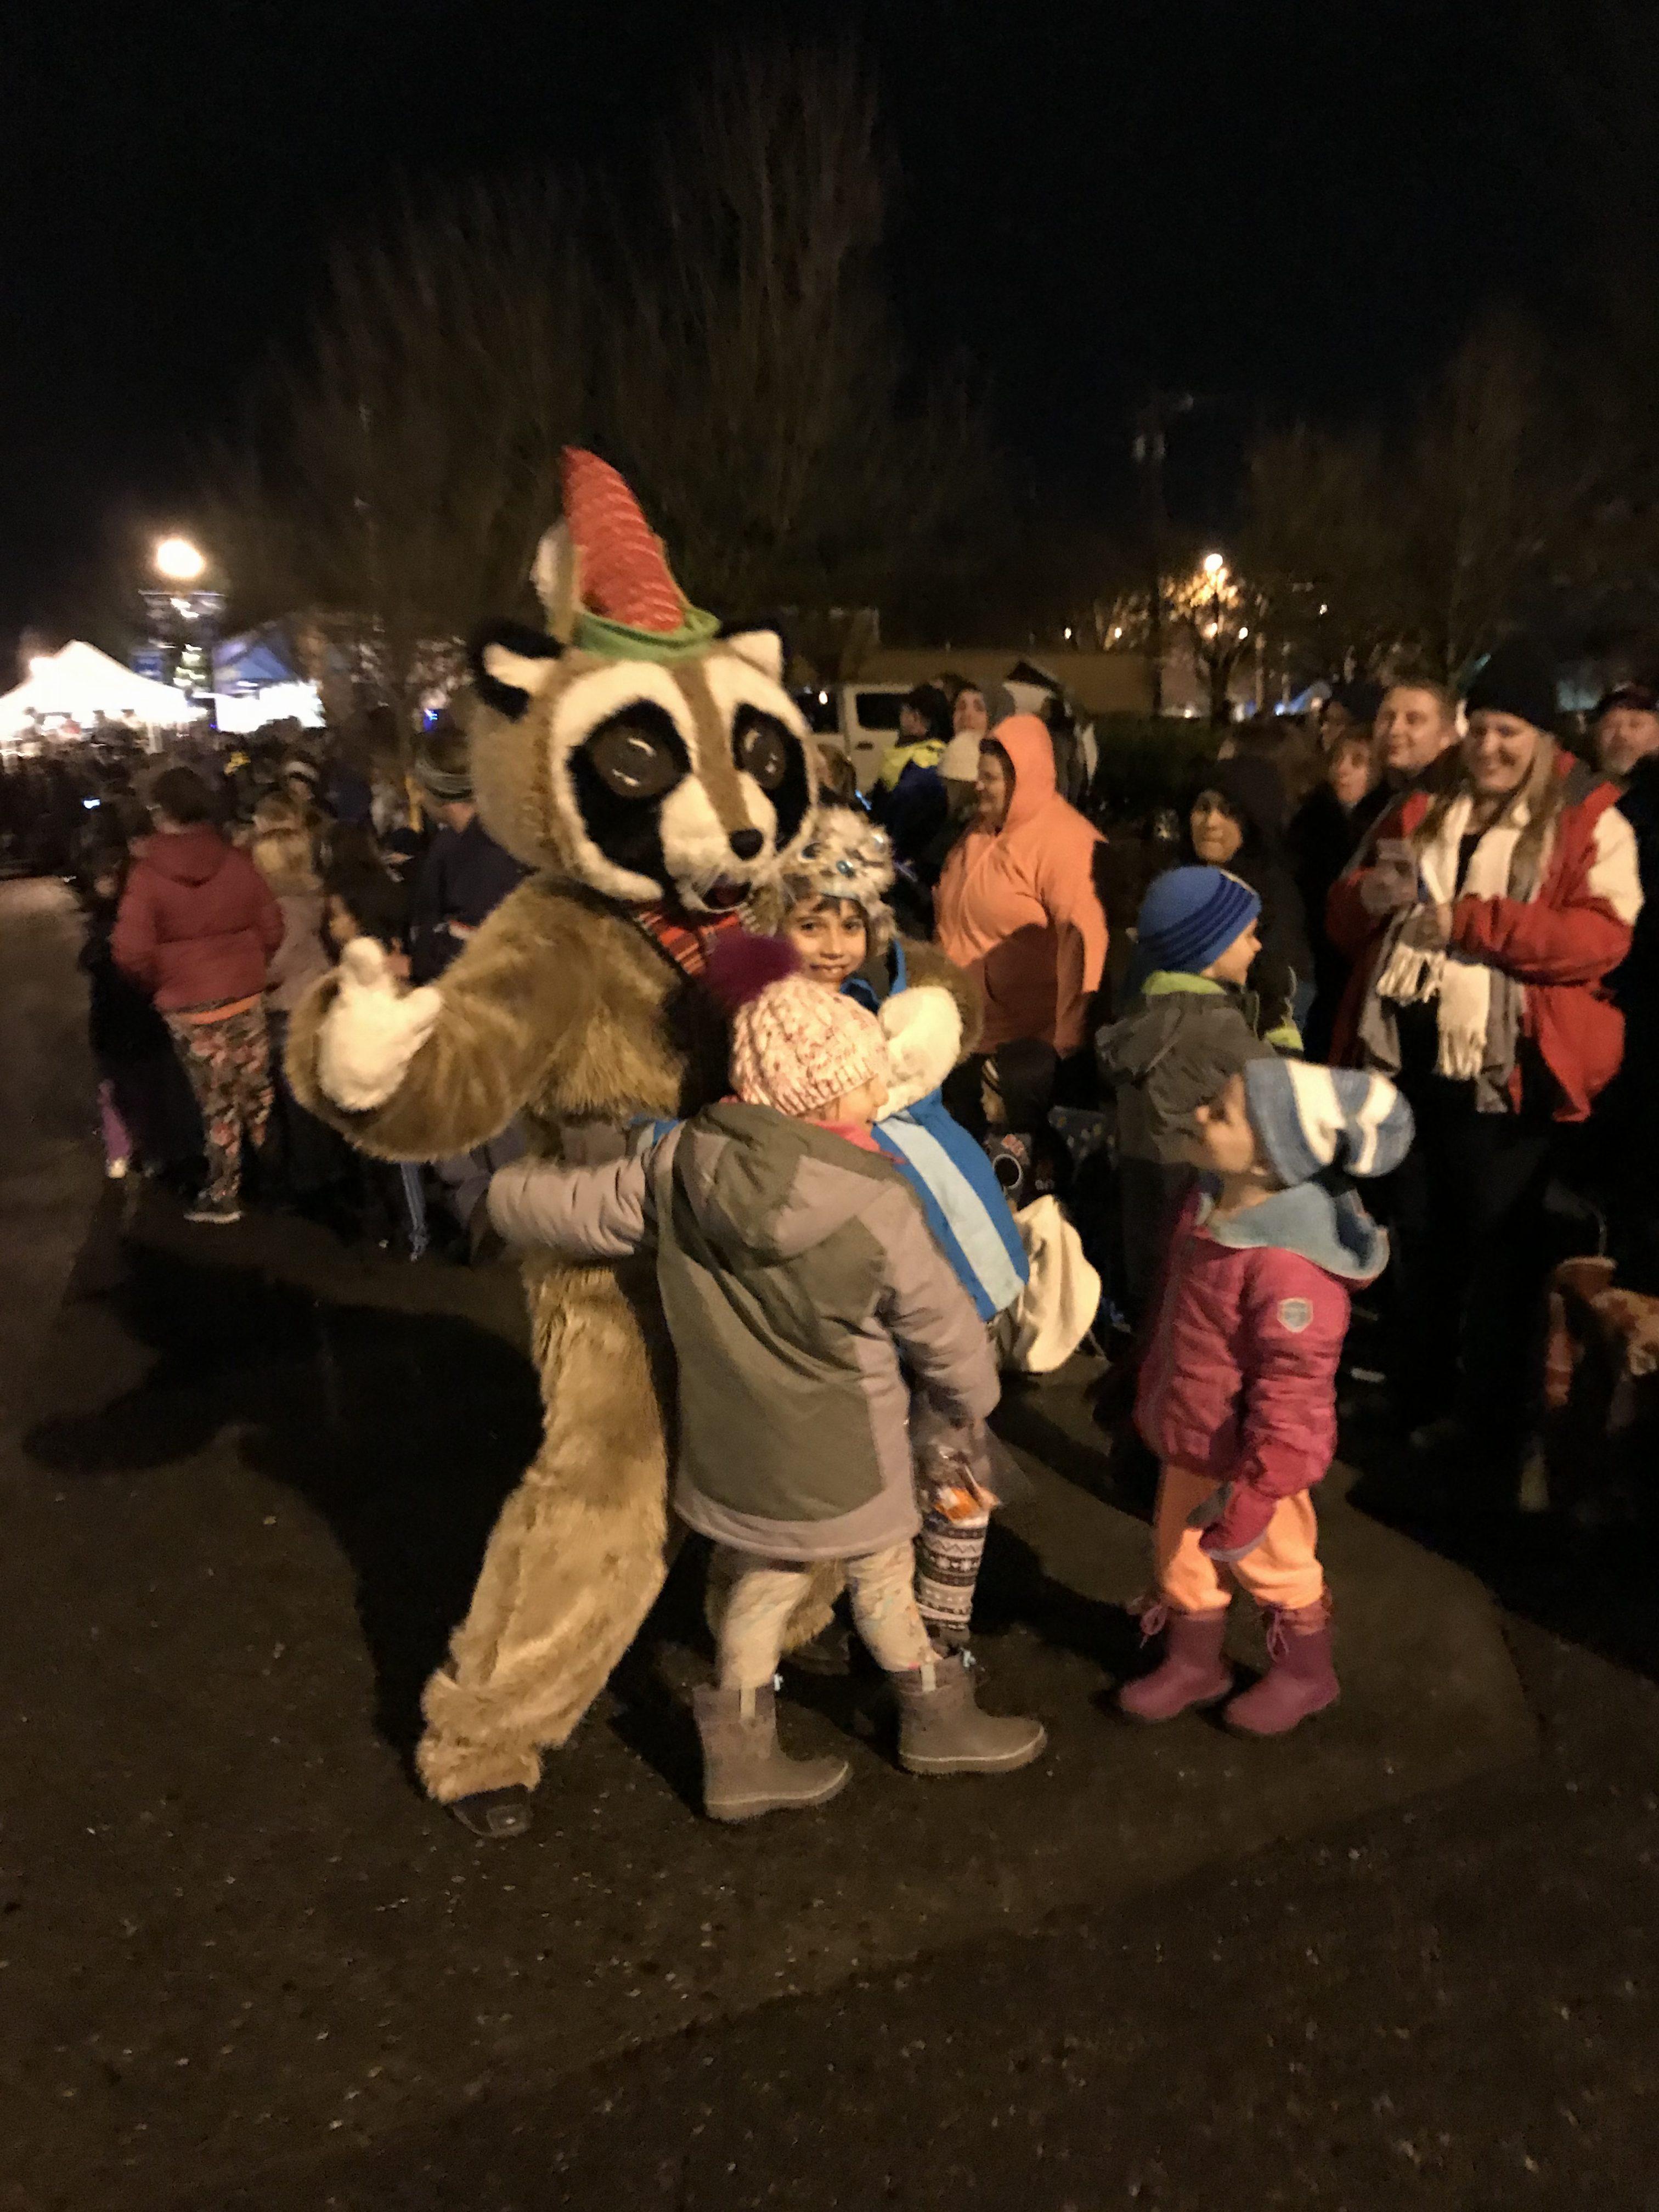 Rocky Raccoon hugging group of kids